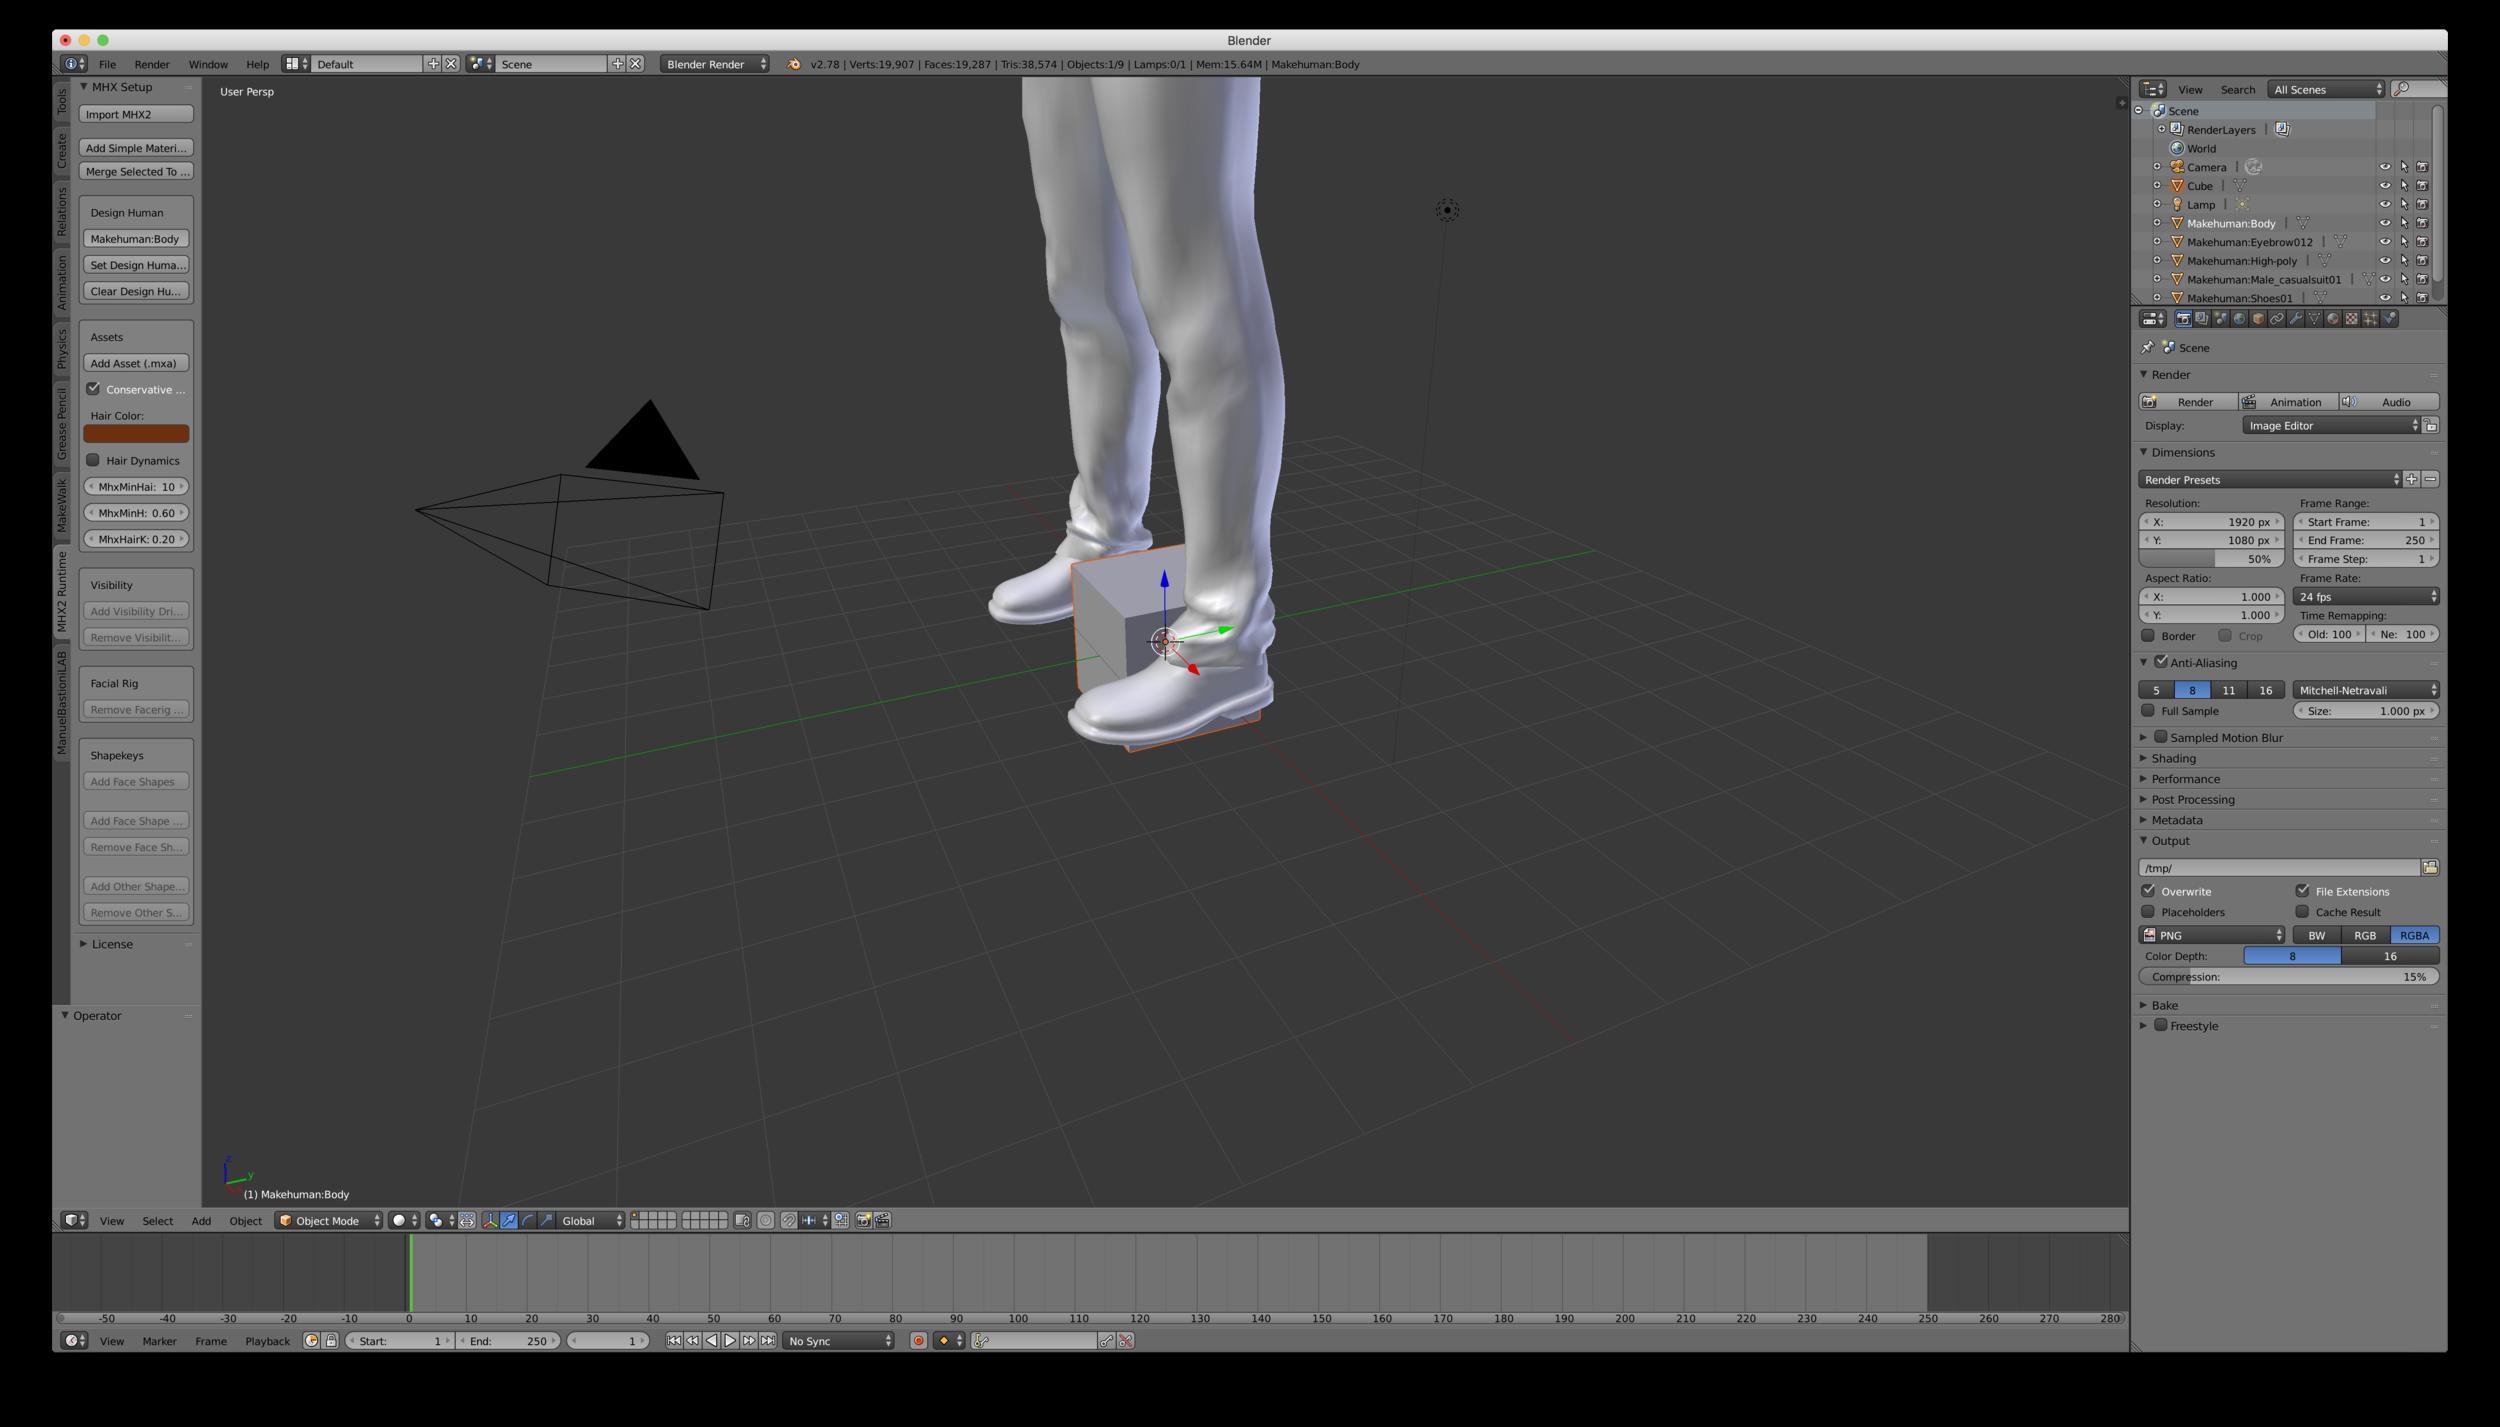 Oversized model imported to Blender 3D